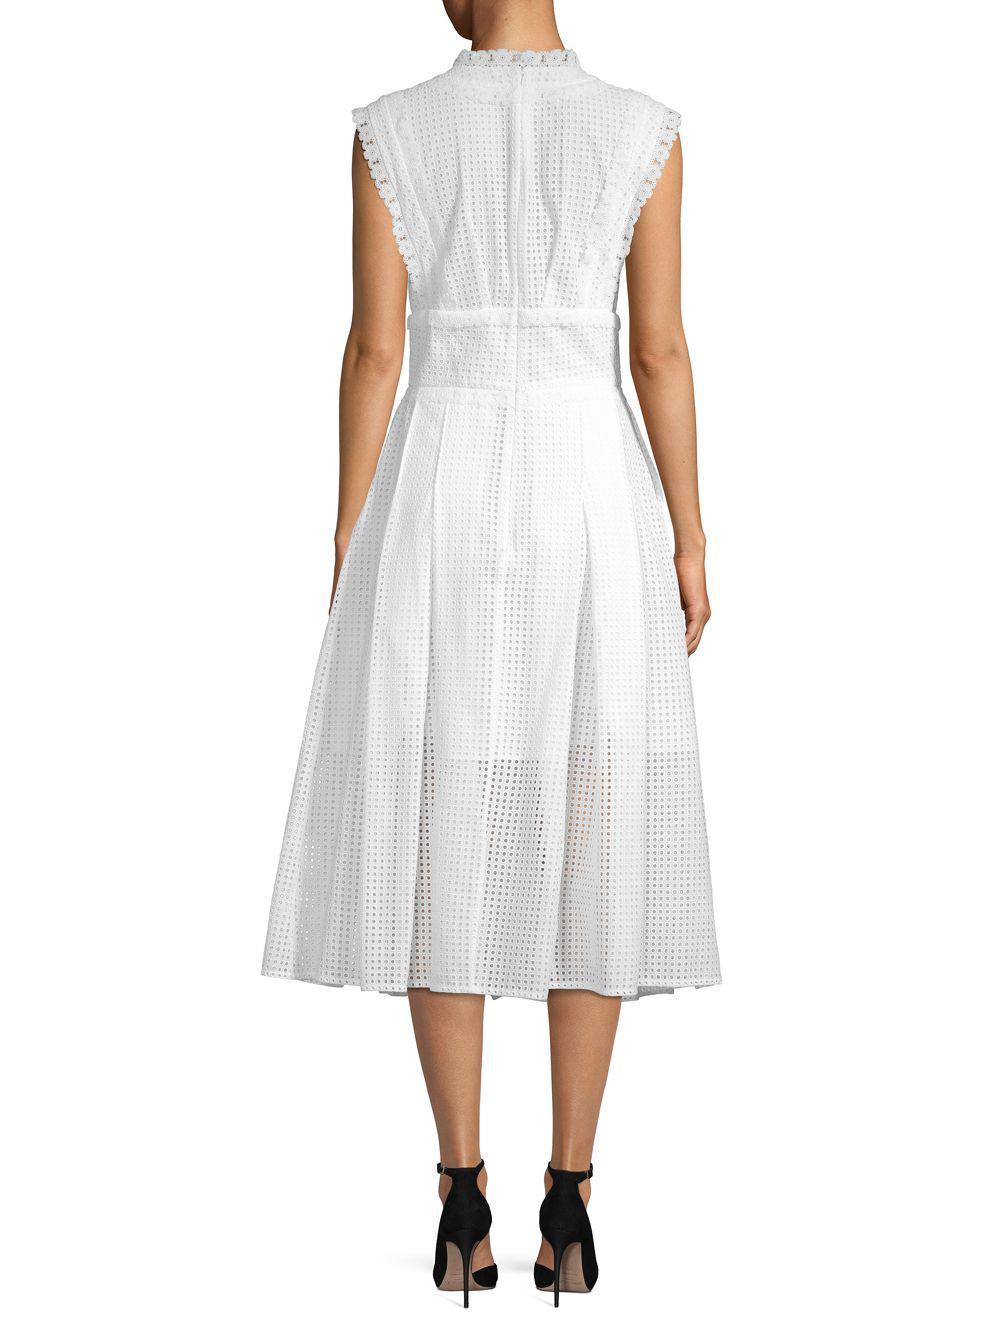 cca277fd2bc Oscar de la Renta - White Lace-trimmed Eyelet Midi Dress - Lyst. View  fullscreen